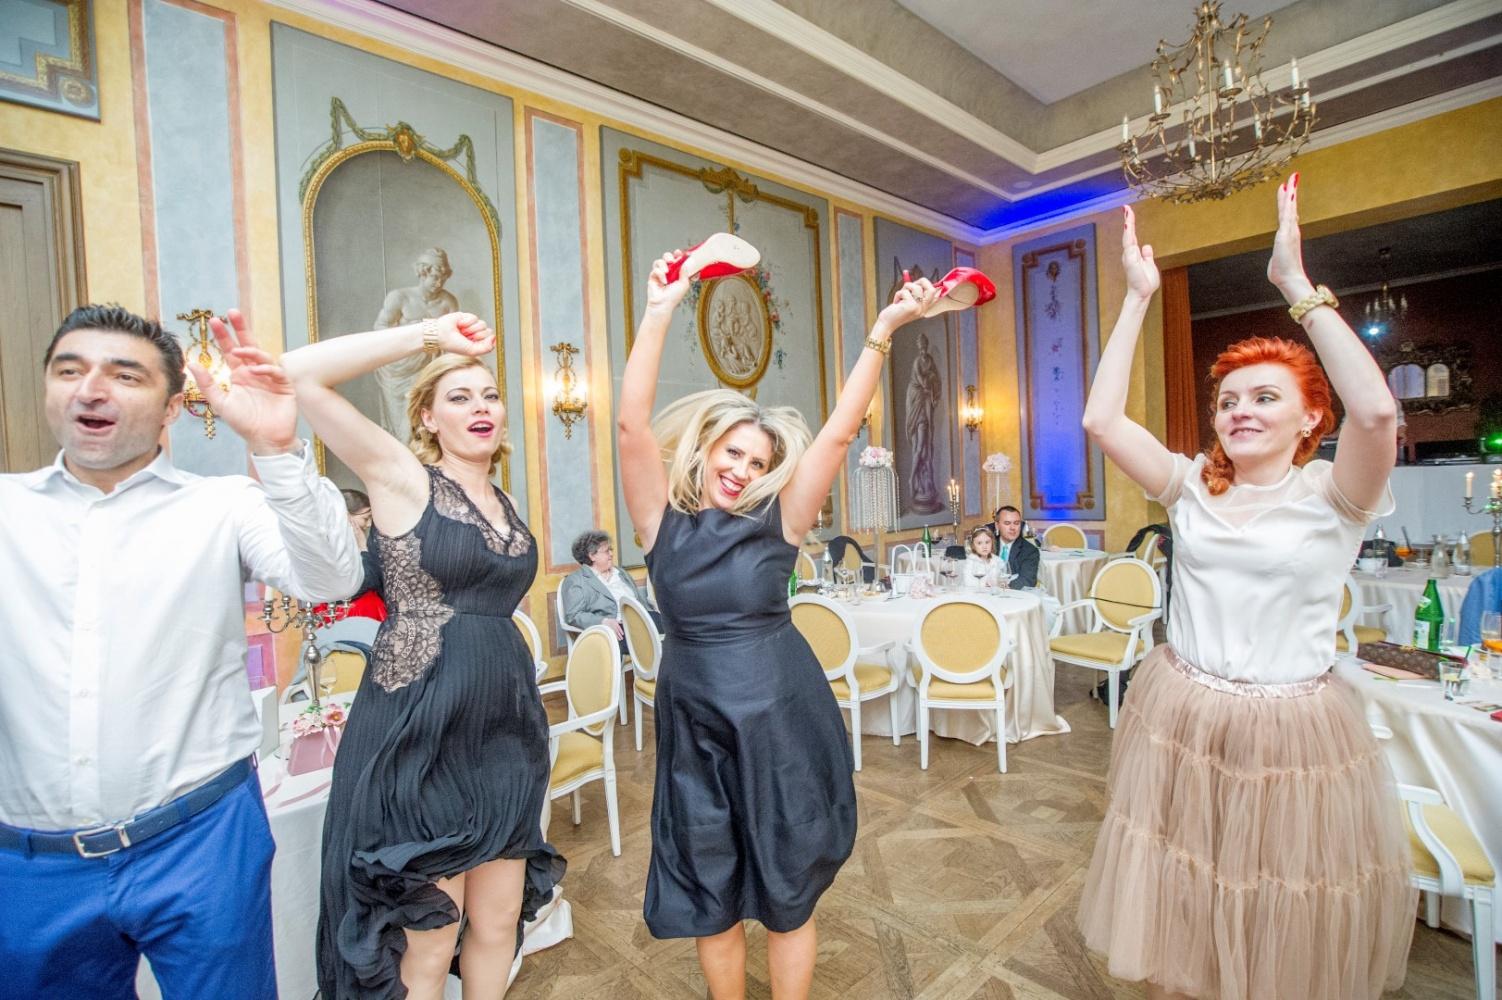 http://www.fotoz.sk/images/gallery-26/normal/svadba_hotel-chateau-bela_168.jpg